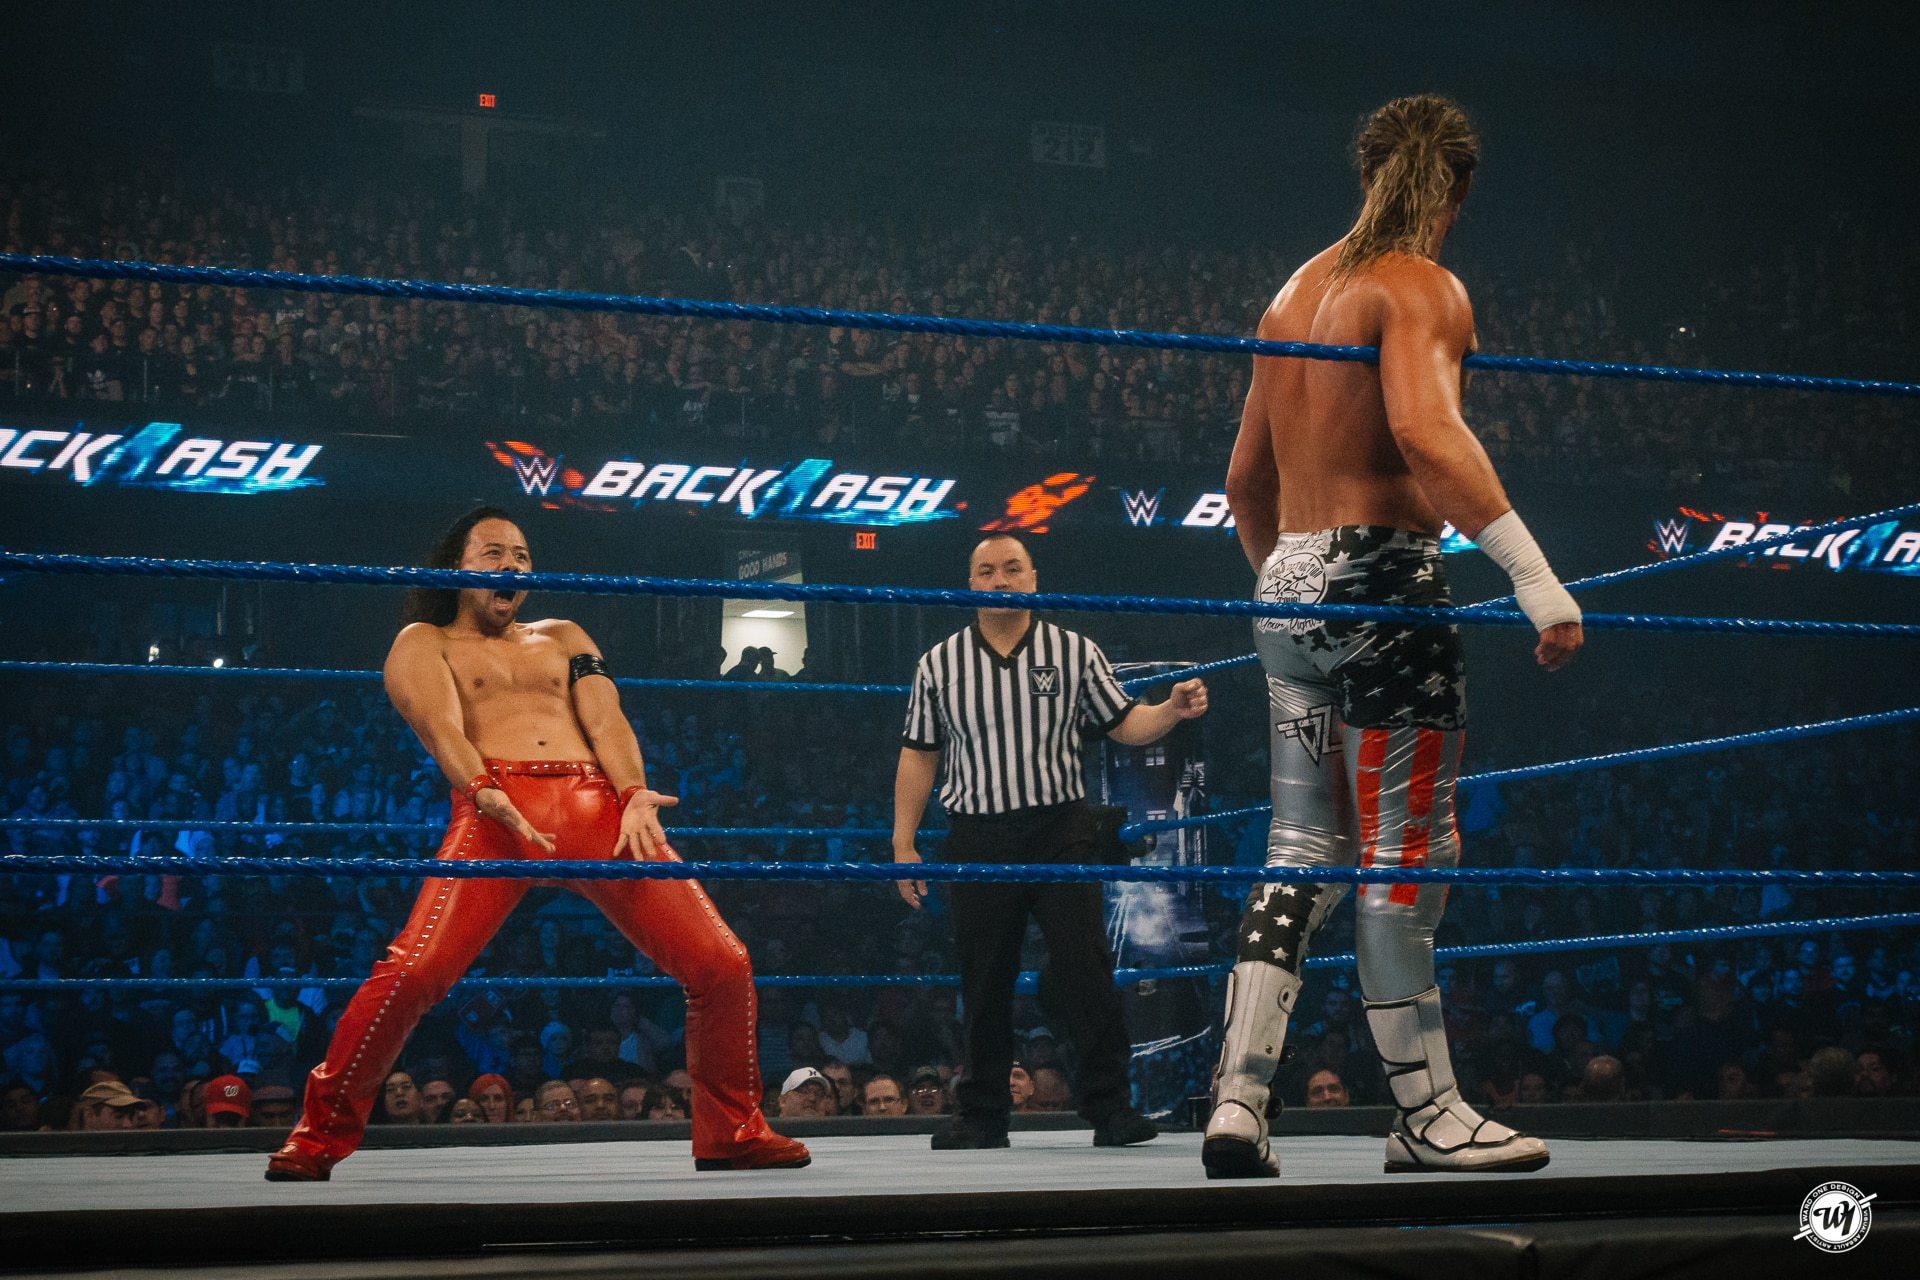 Shinsuke Nakamura at WWE Backlash 2017